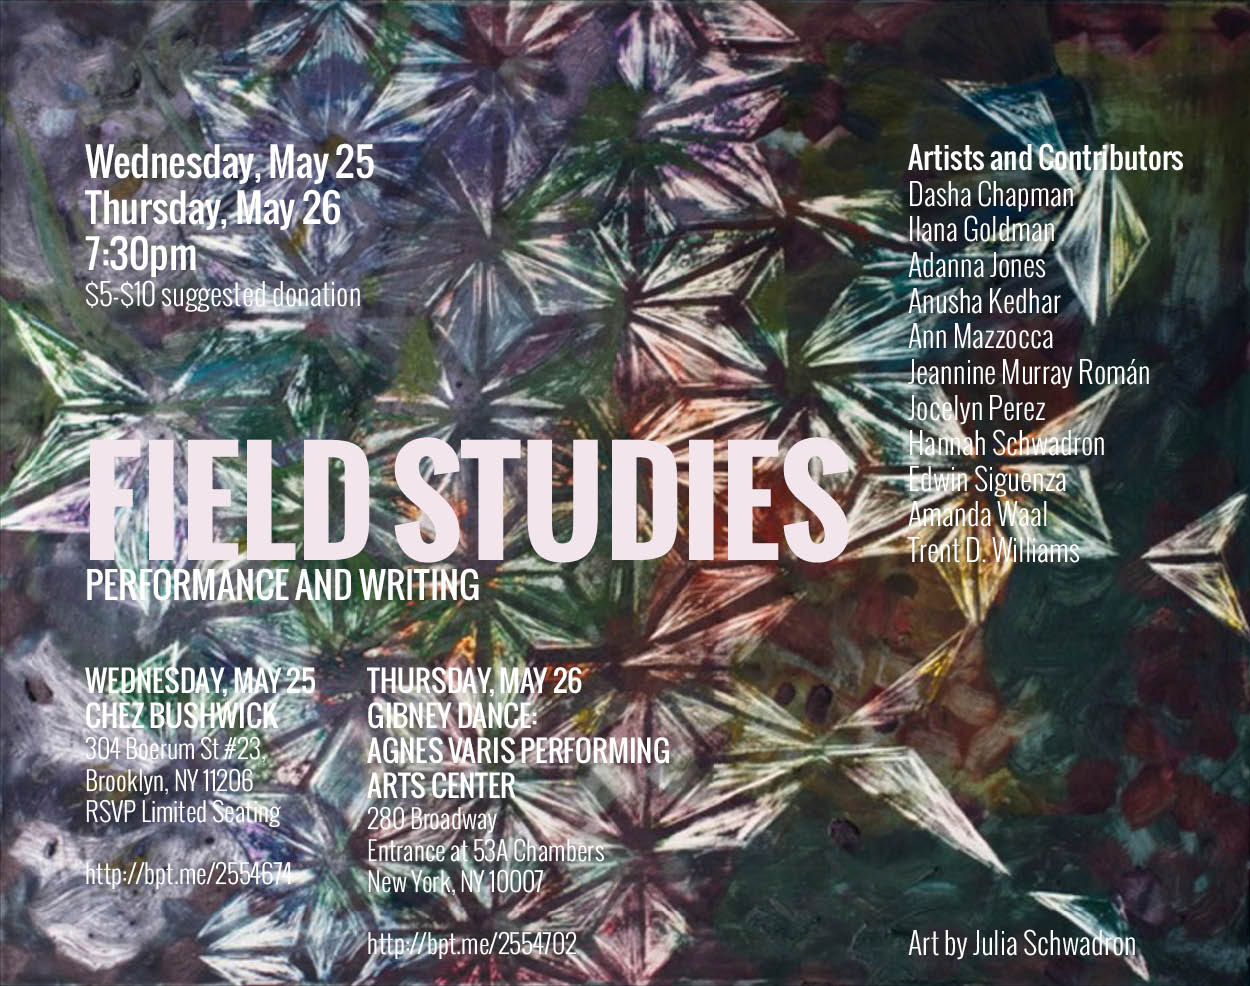 Field Studies, 3rd edition, Chez Bushwick and Gibney Dance